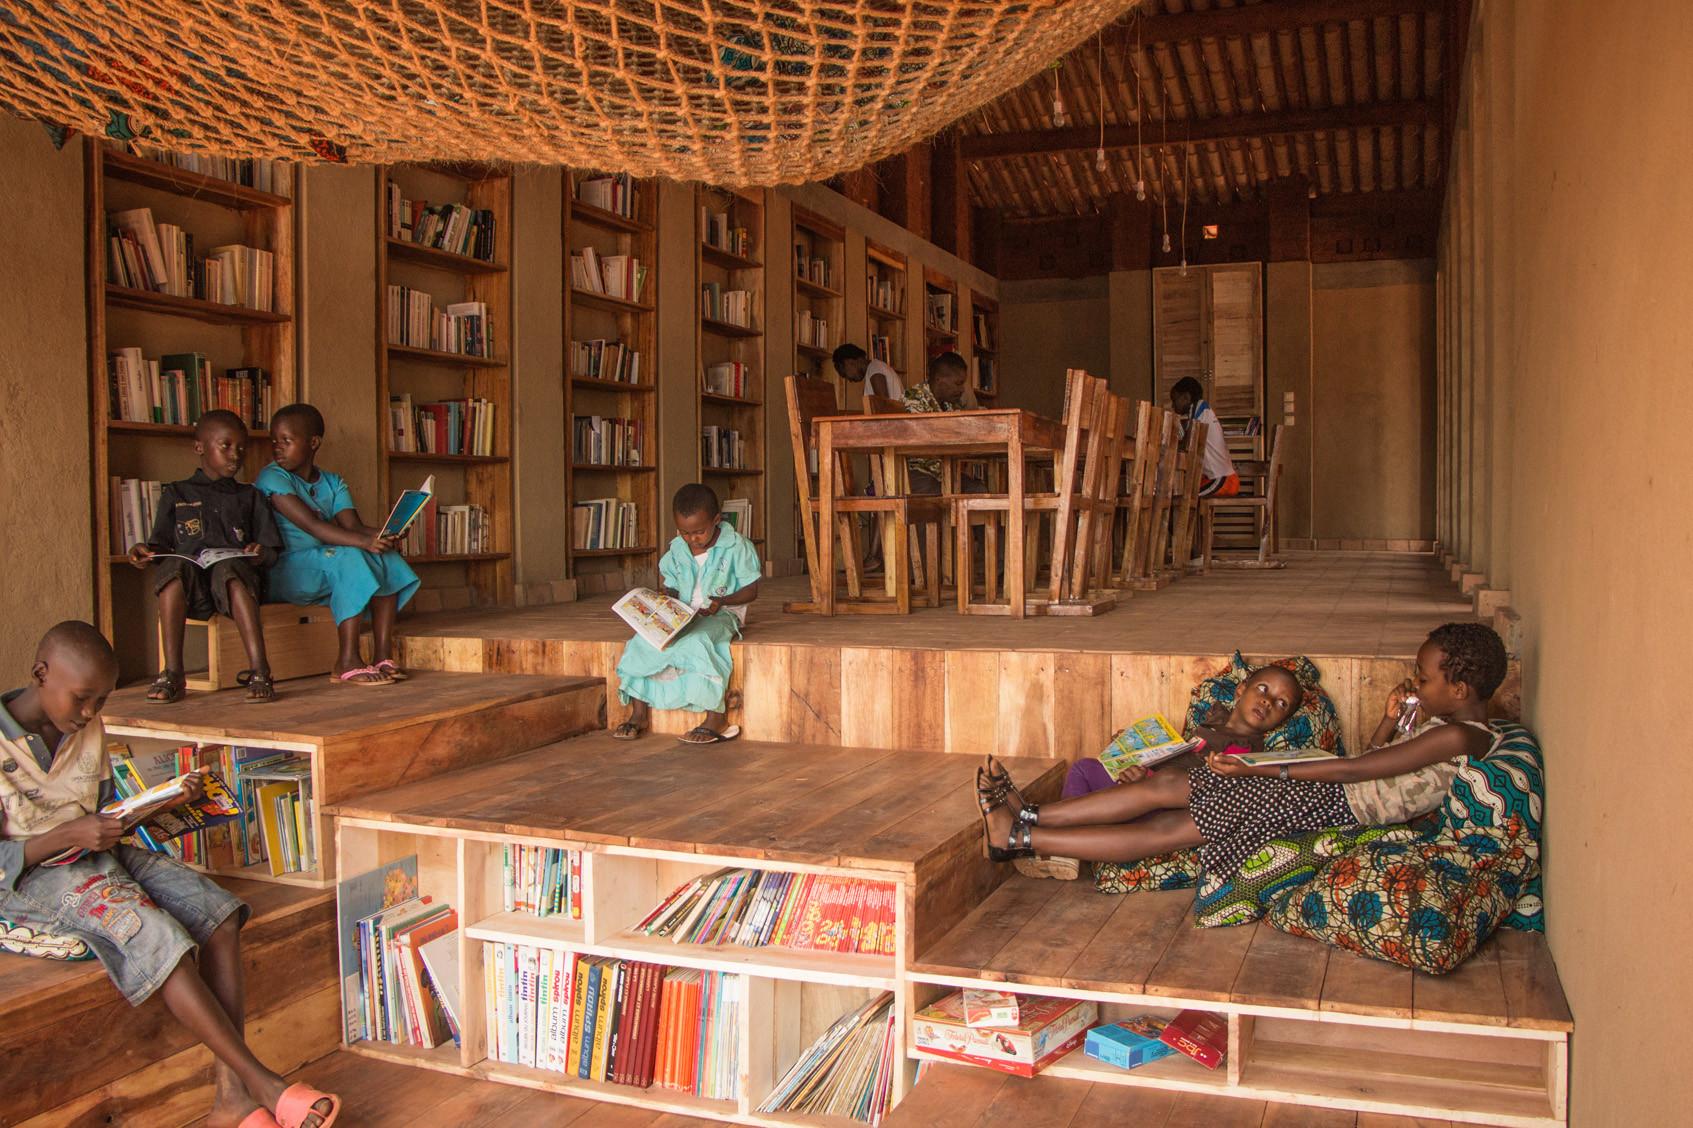 La biblioteca de Muyinga, en Burundi, fue diseñada por BC Architects (BC Architects)